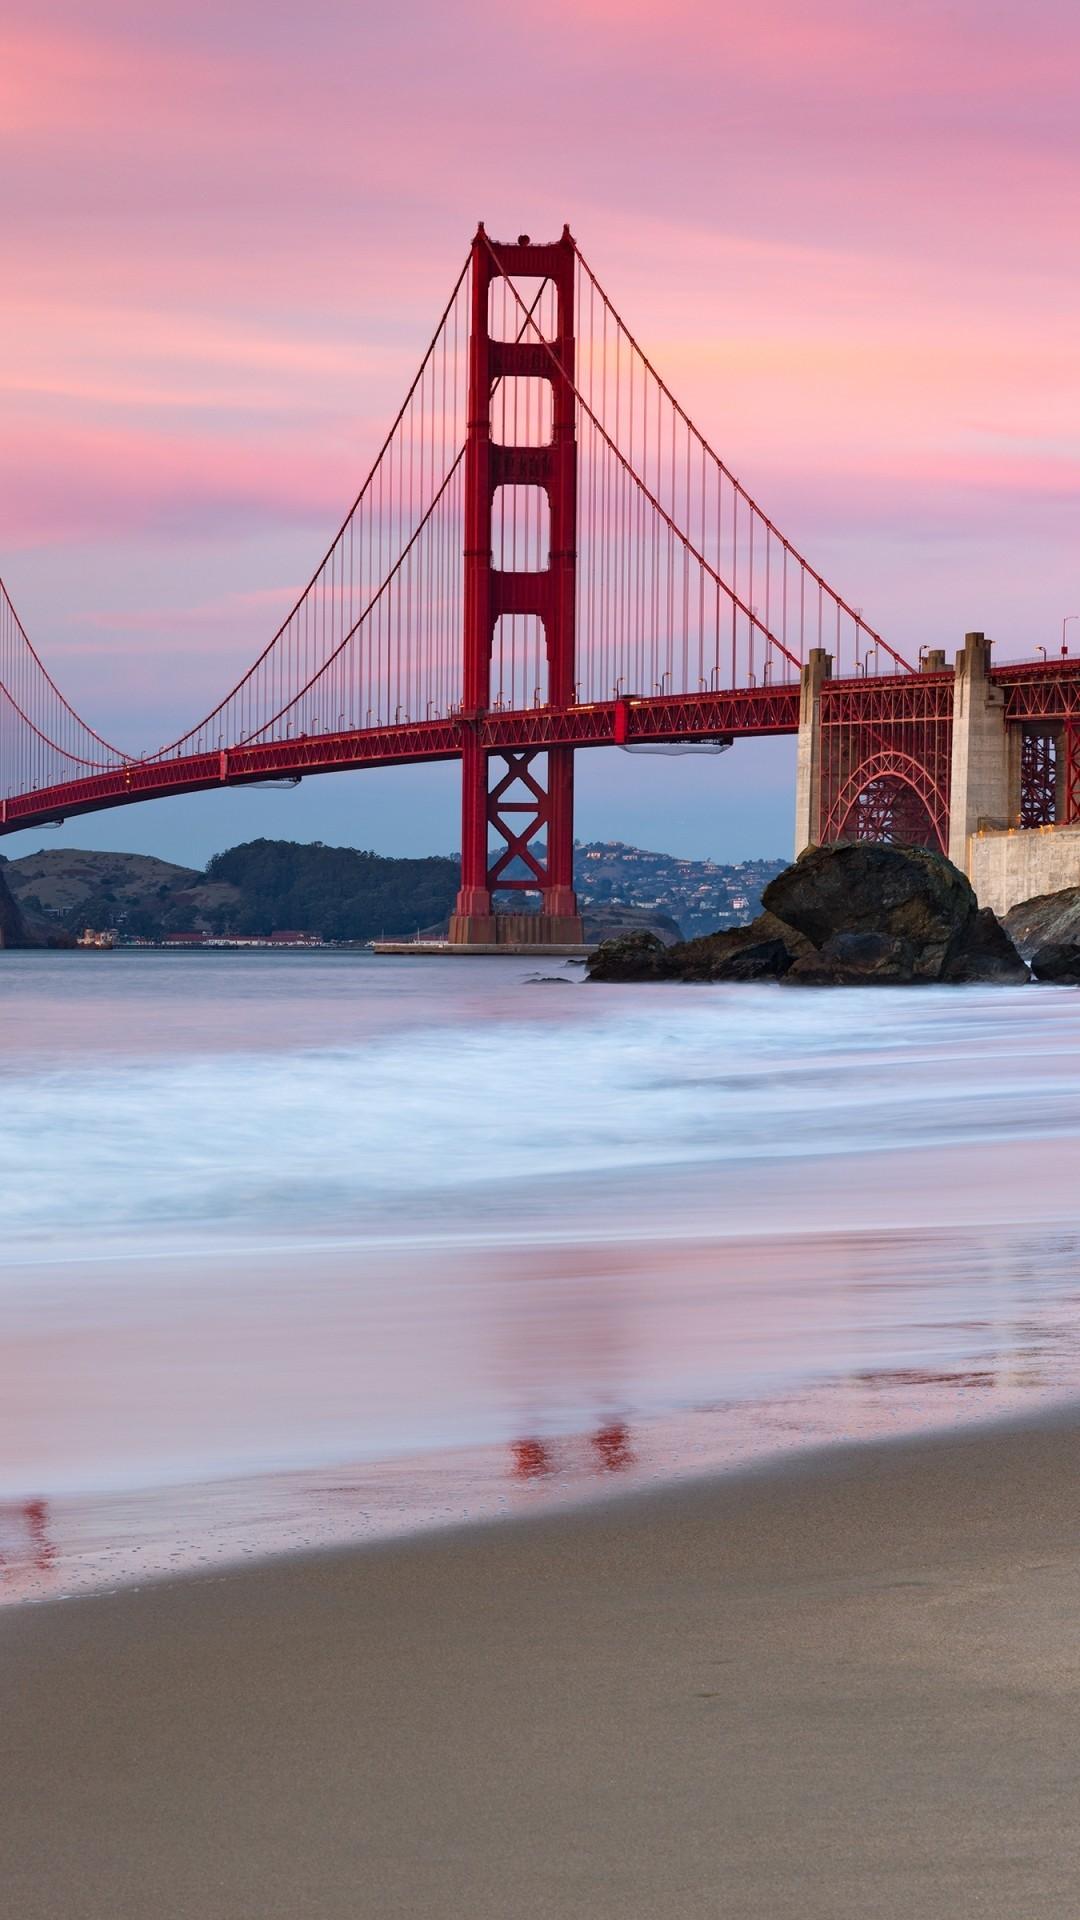 Golden Gate Bridge iphone 7 wallpaper